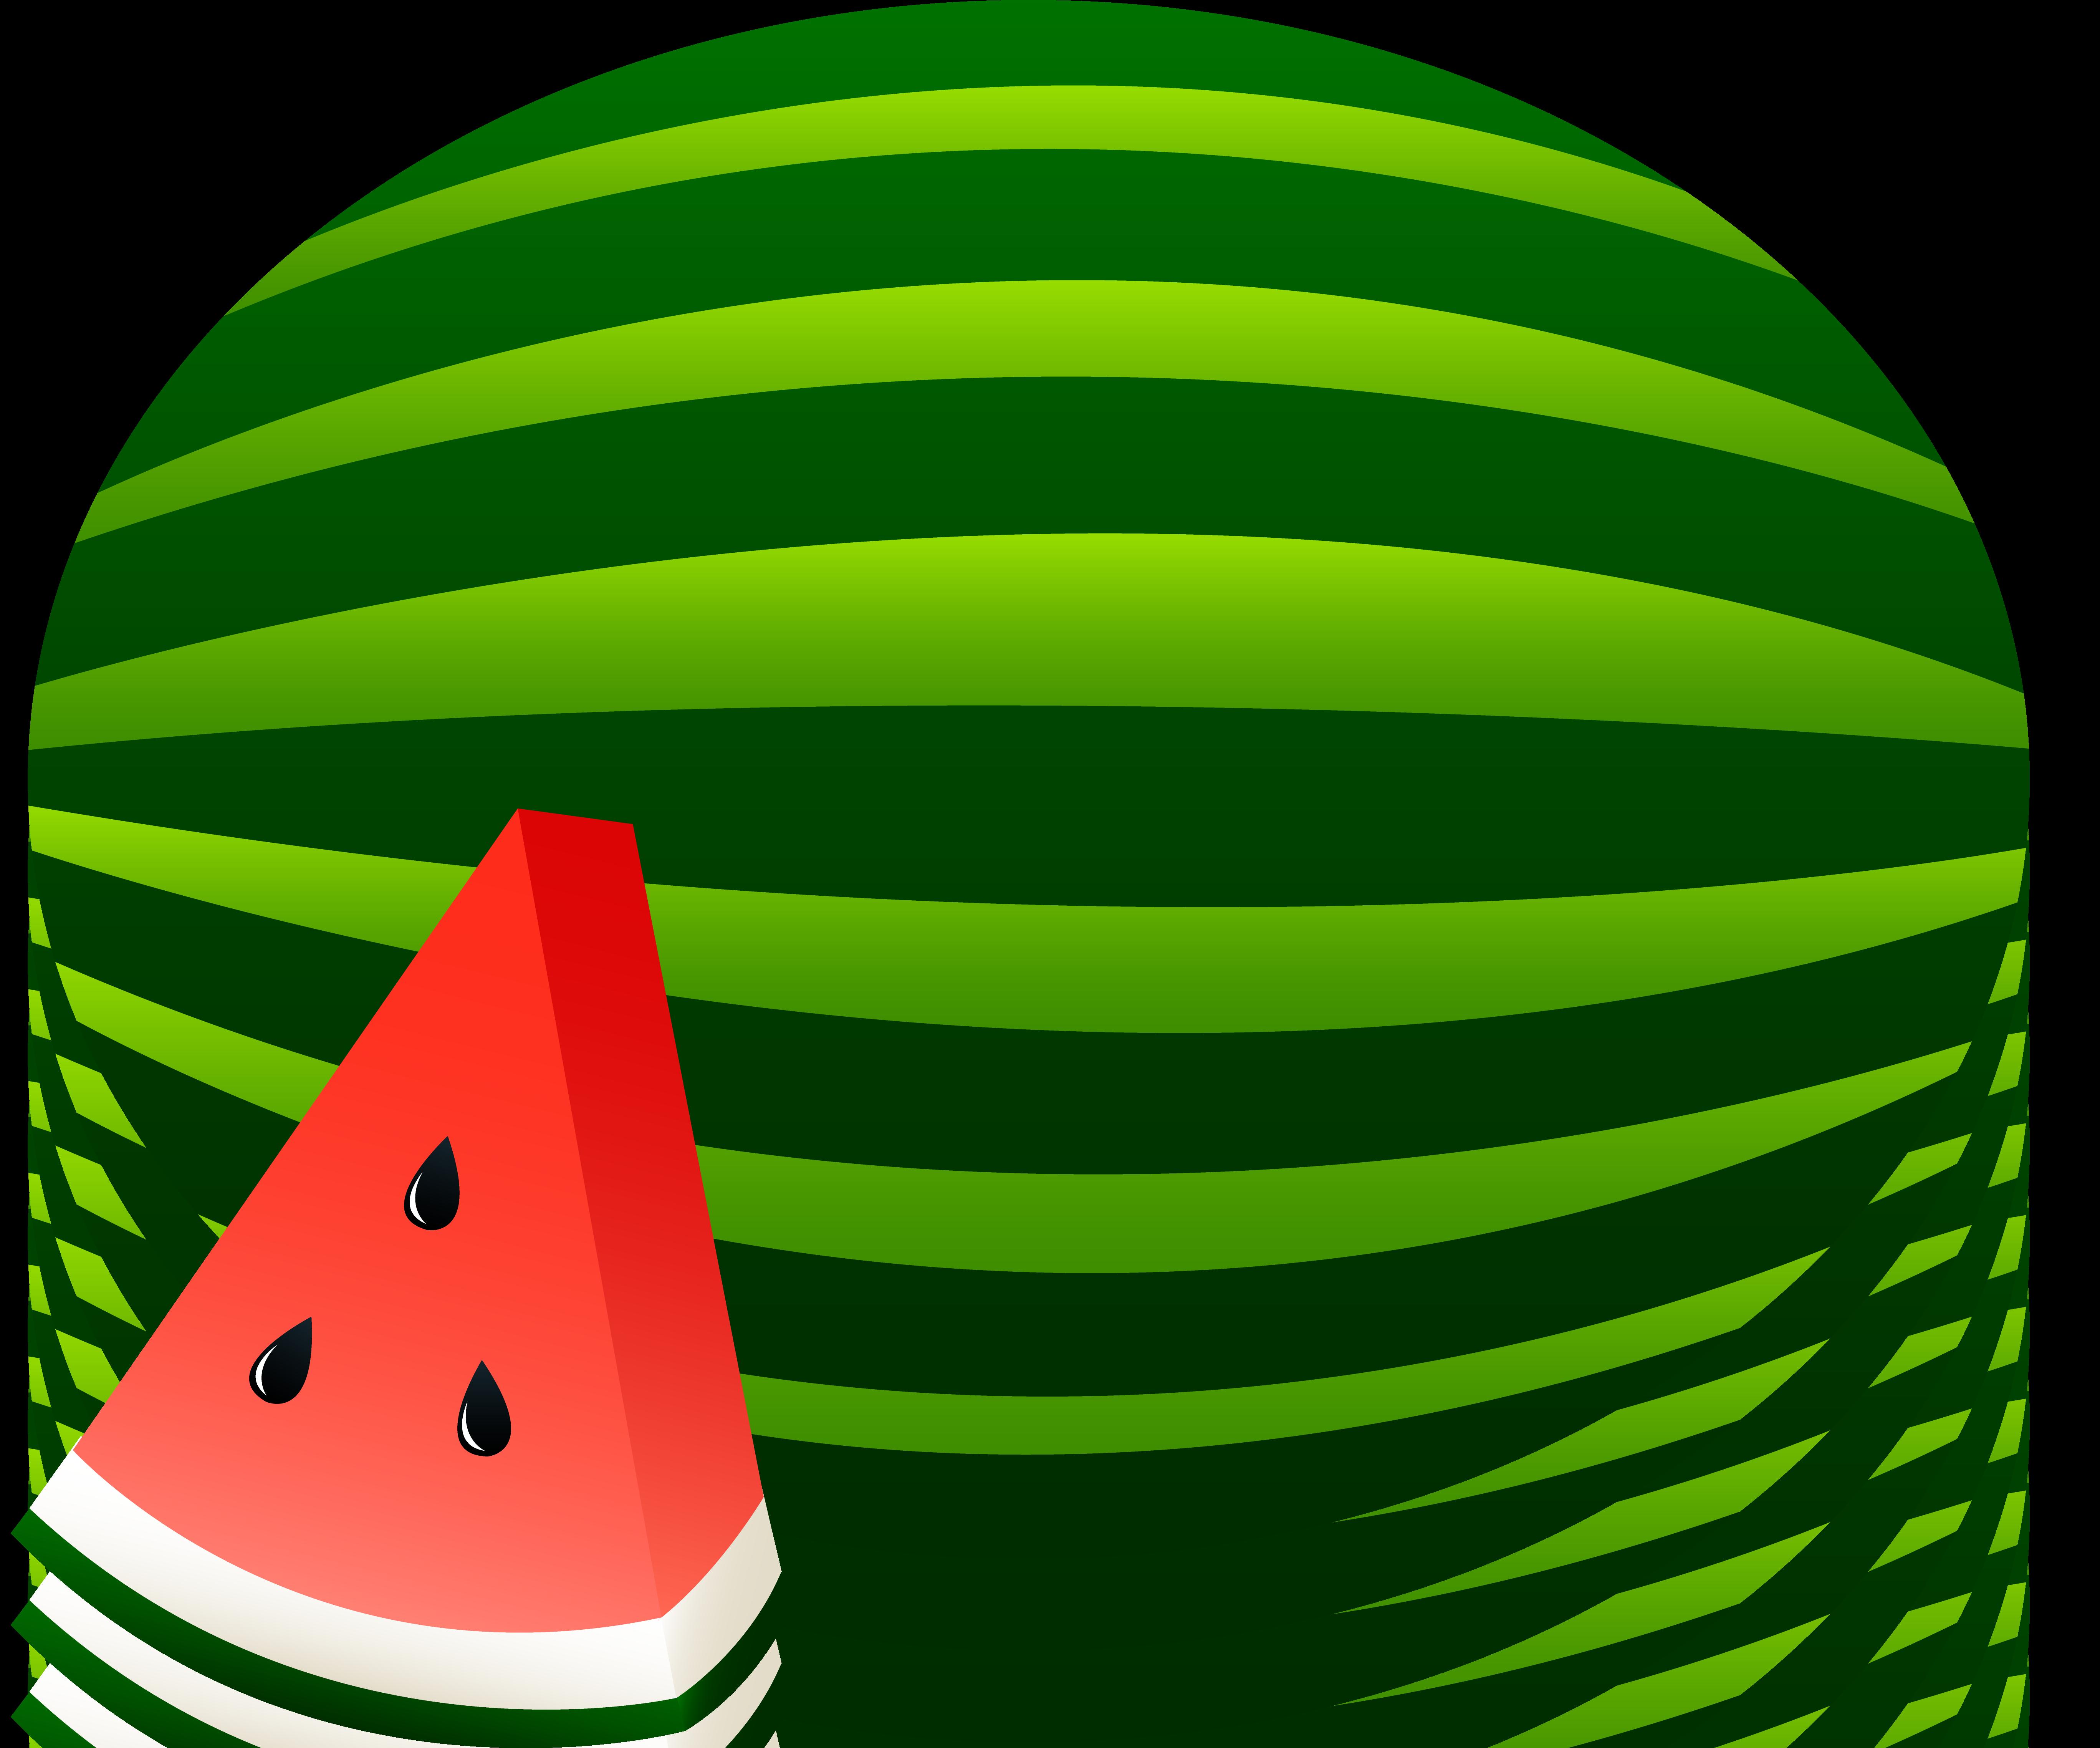 5469x4551 Watermelon Clipart Black And White Free